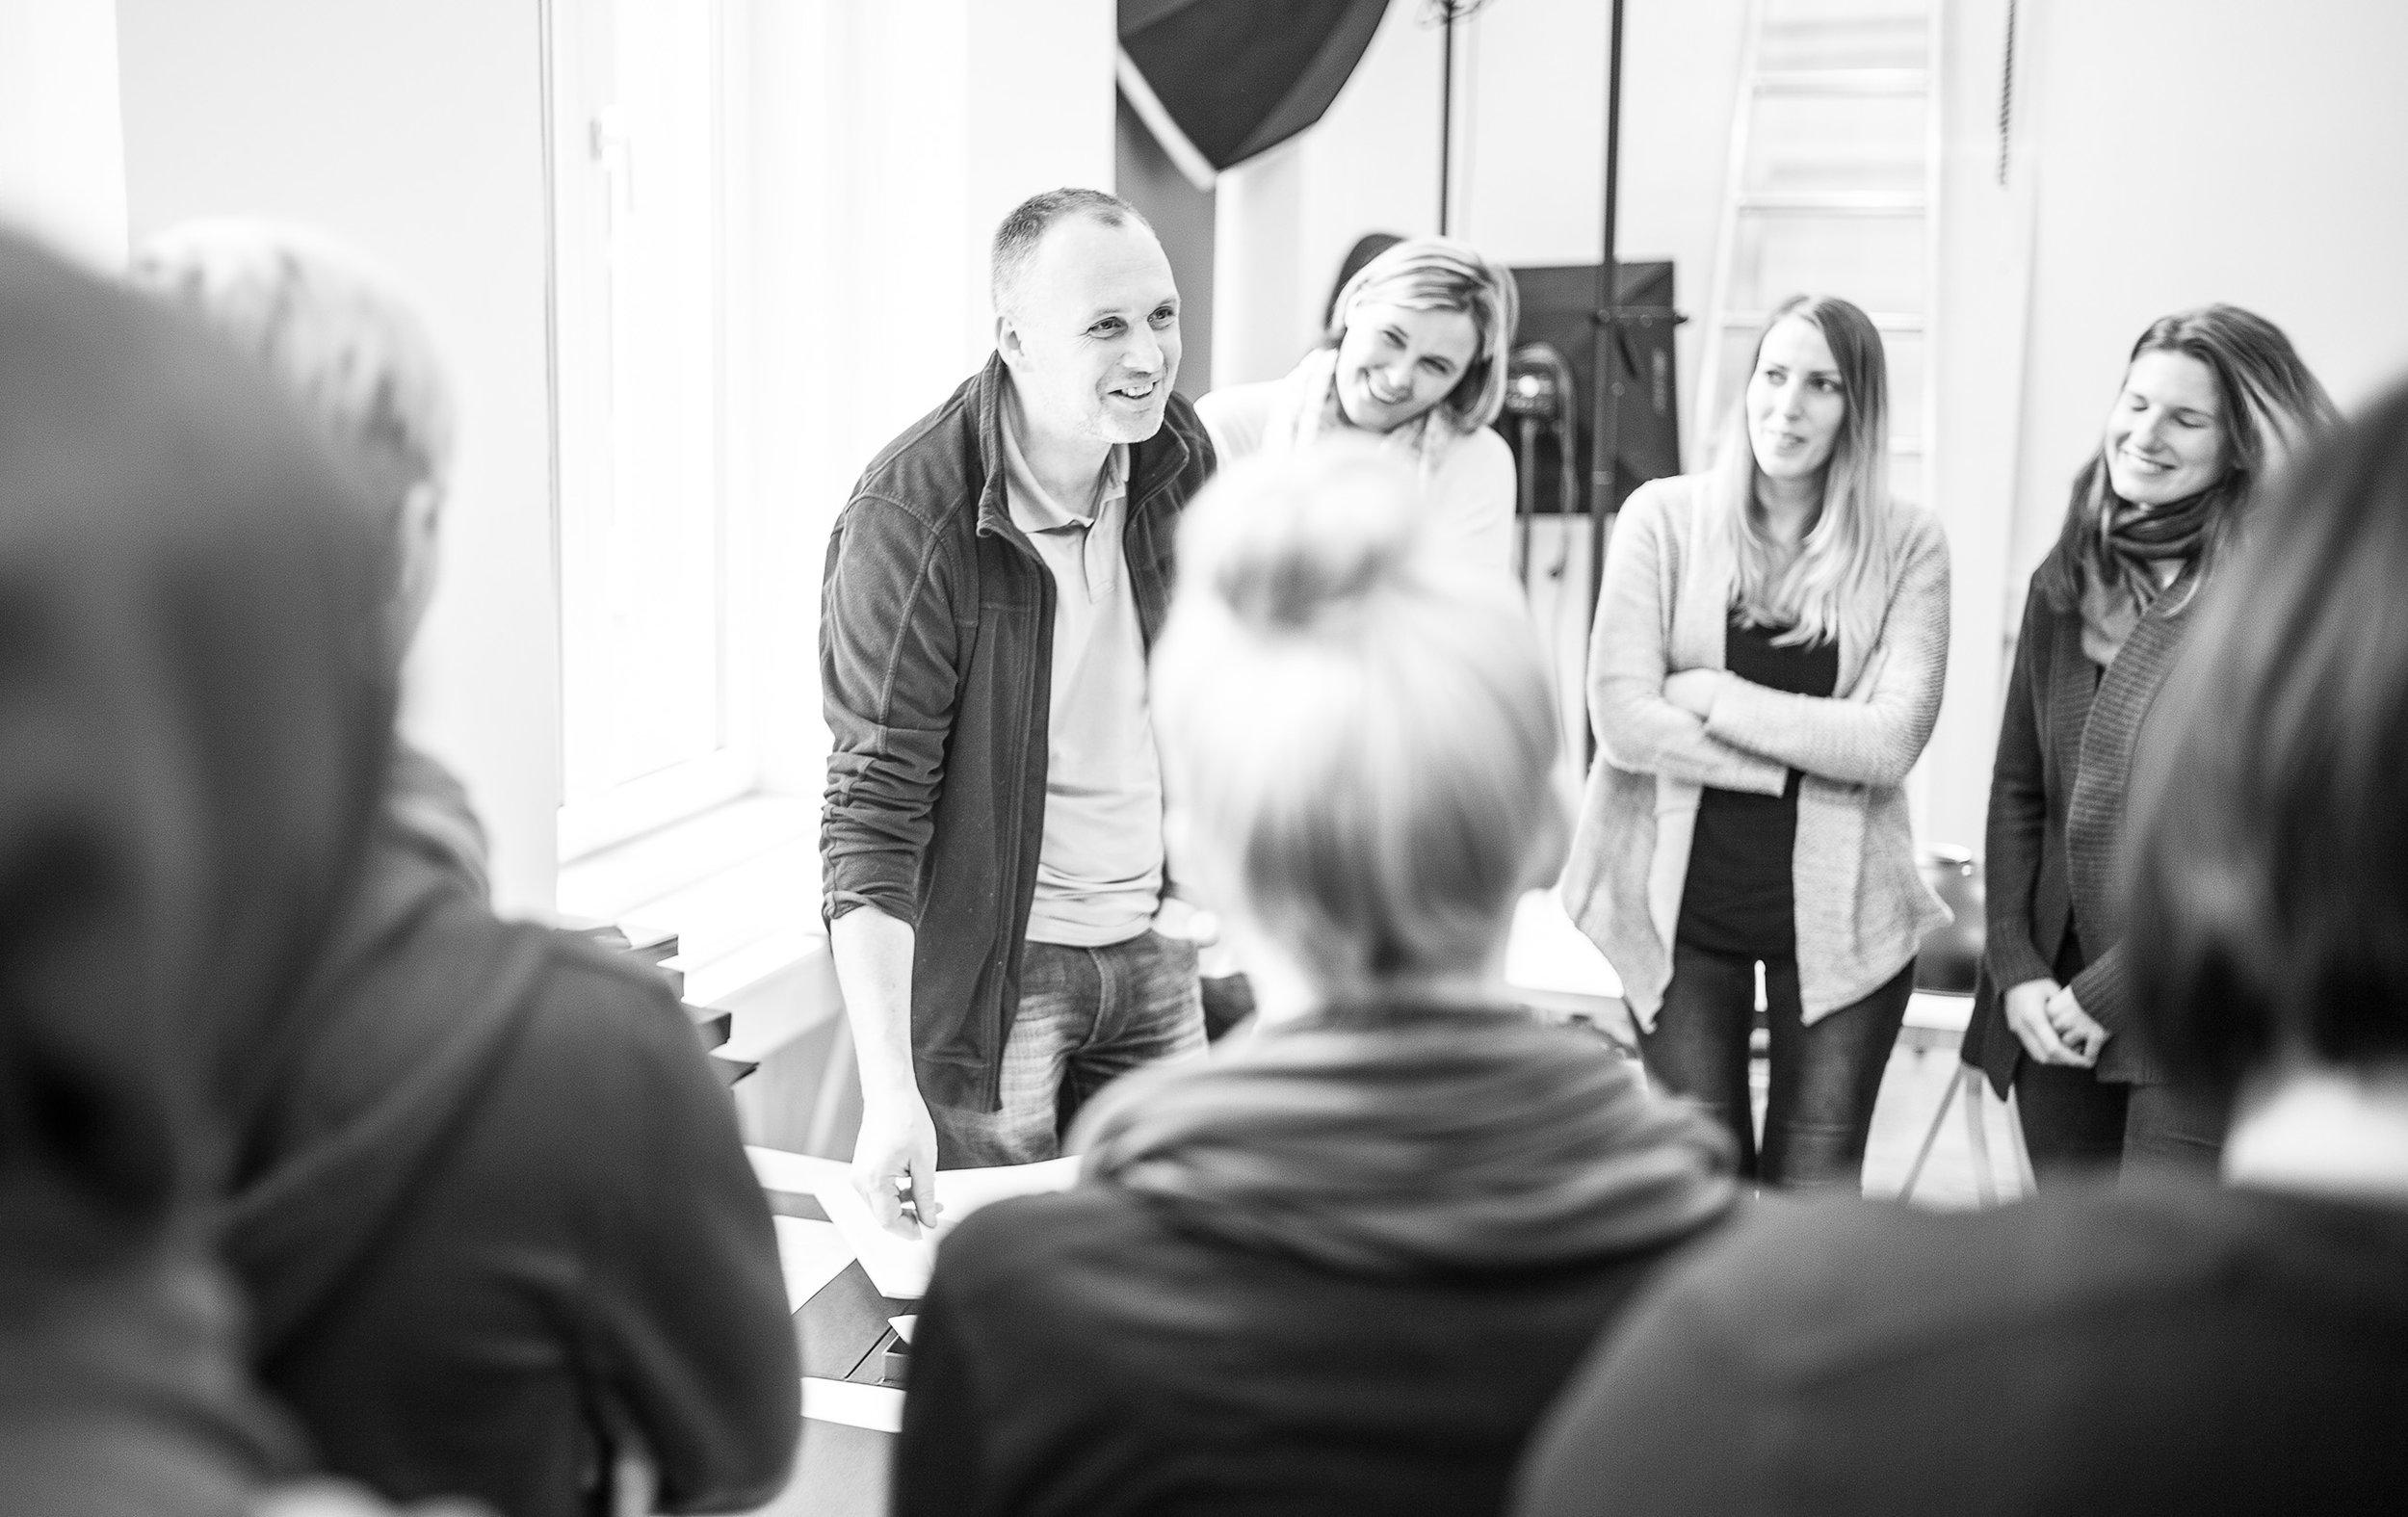 Teilnehmer/innen an der LIK Meisterklasse digitale Fotografie